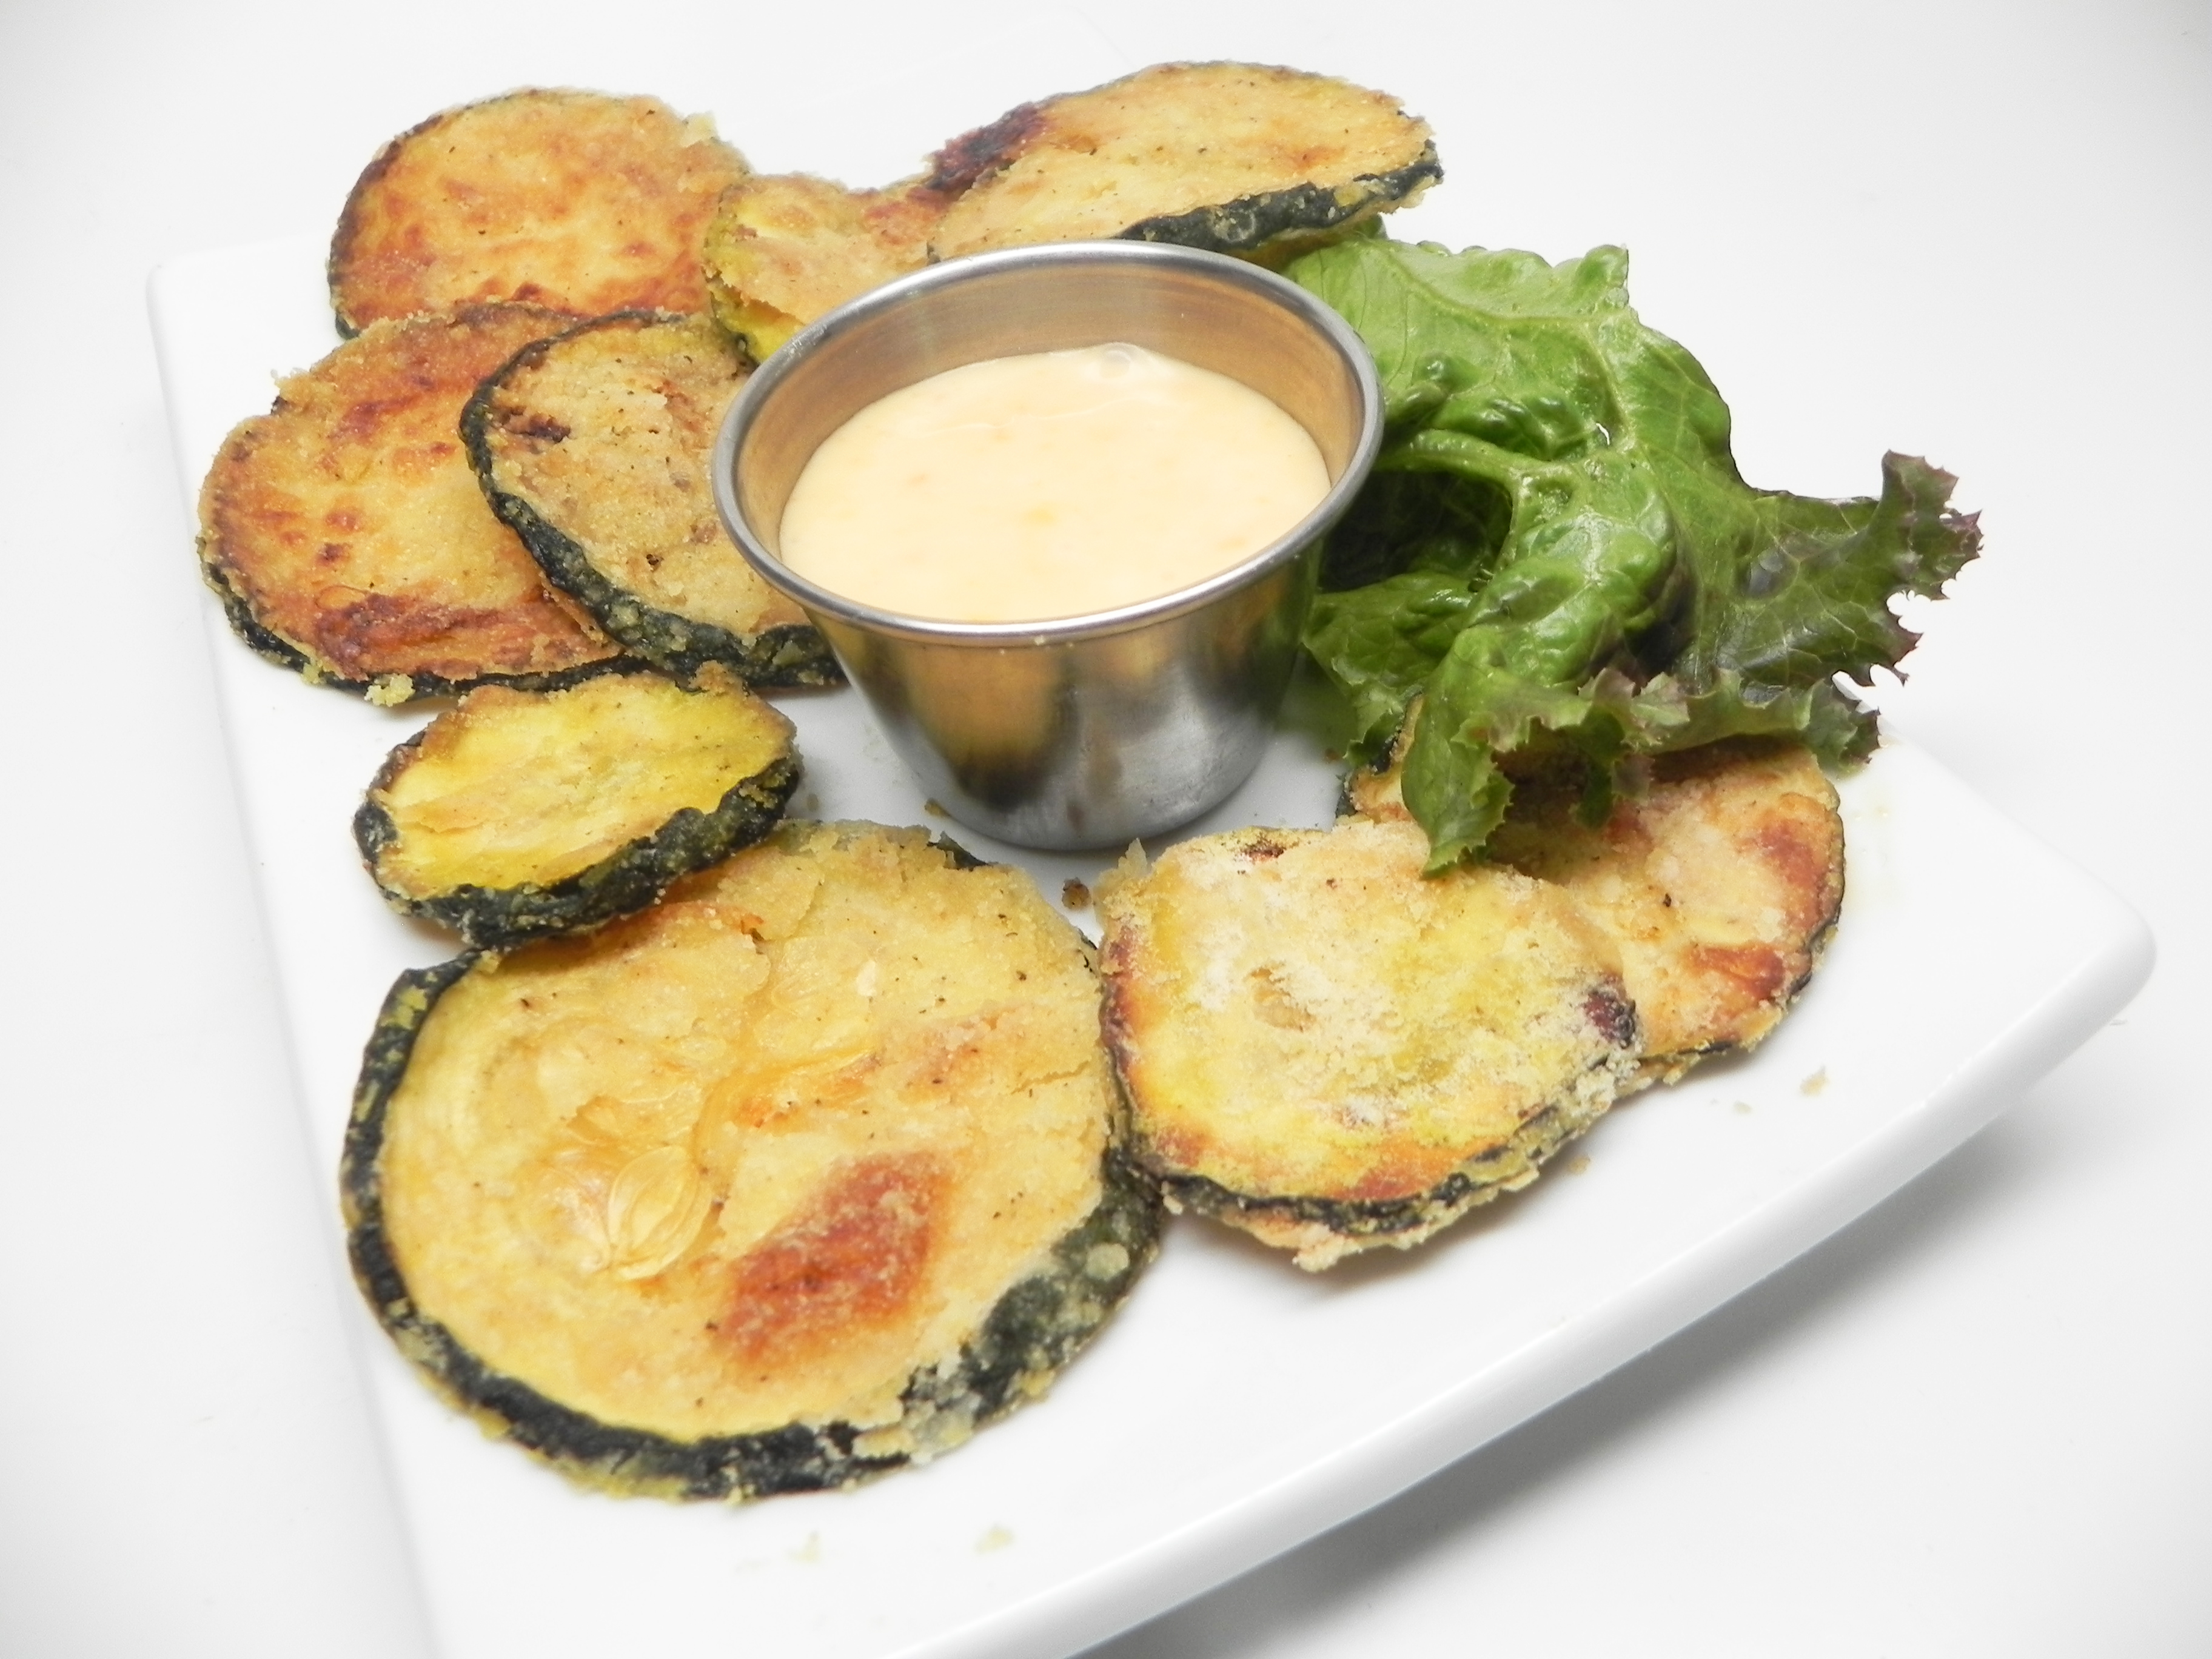 Vegan Crispy Baked Zucchini Rounds